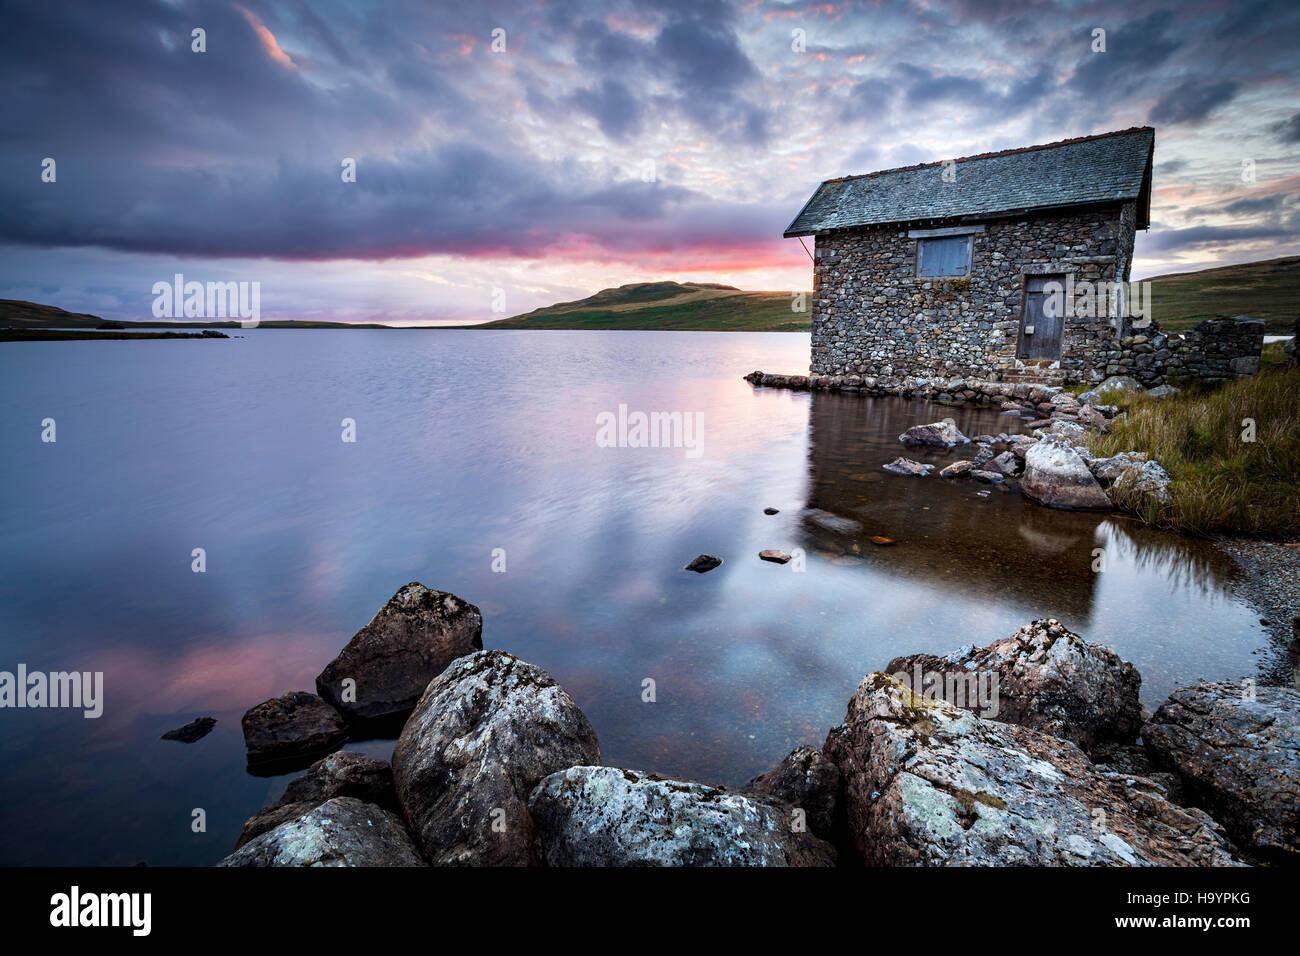 El viejo cobertizo en Devoke agua en el Lake District, Cumbria Imagen De Stock